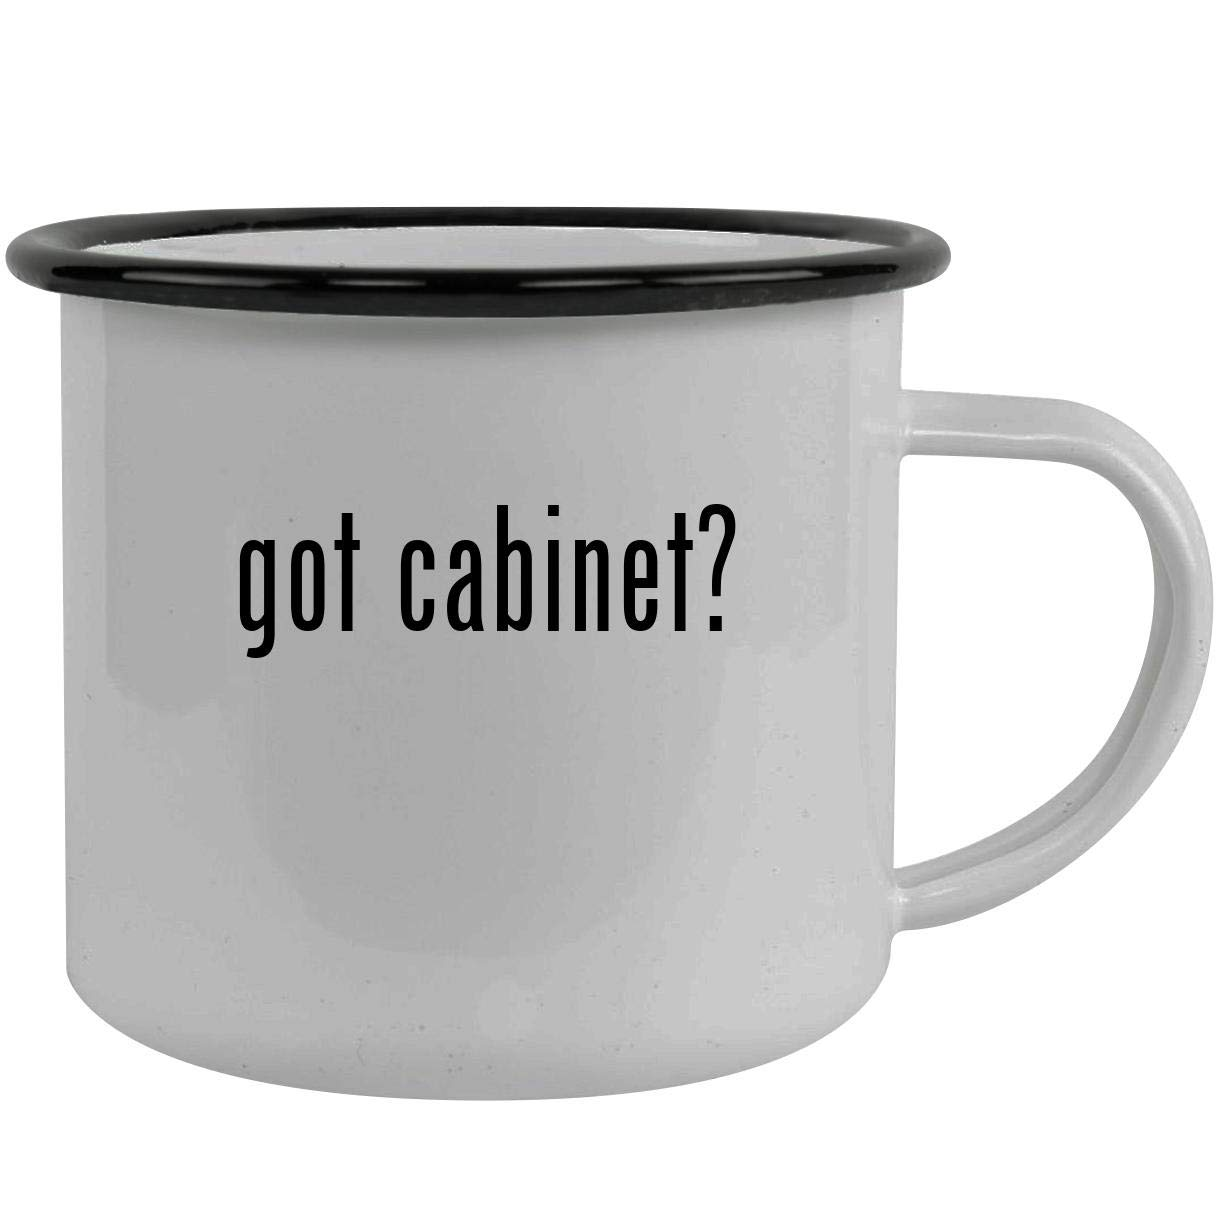 got cabinet? - Stainless Steel 12oz Camping Mug, Black